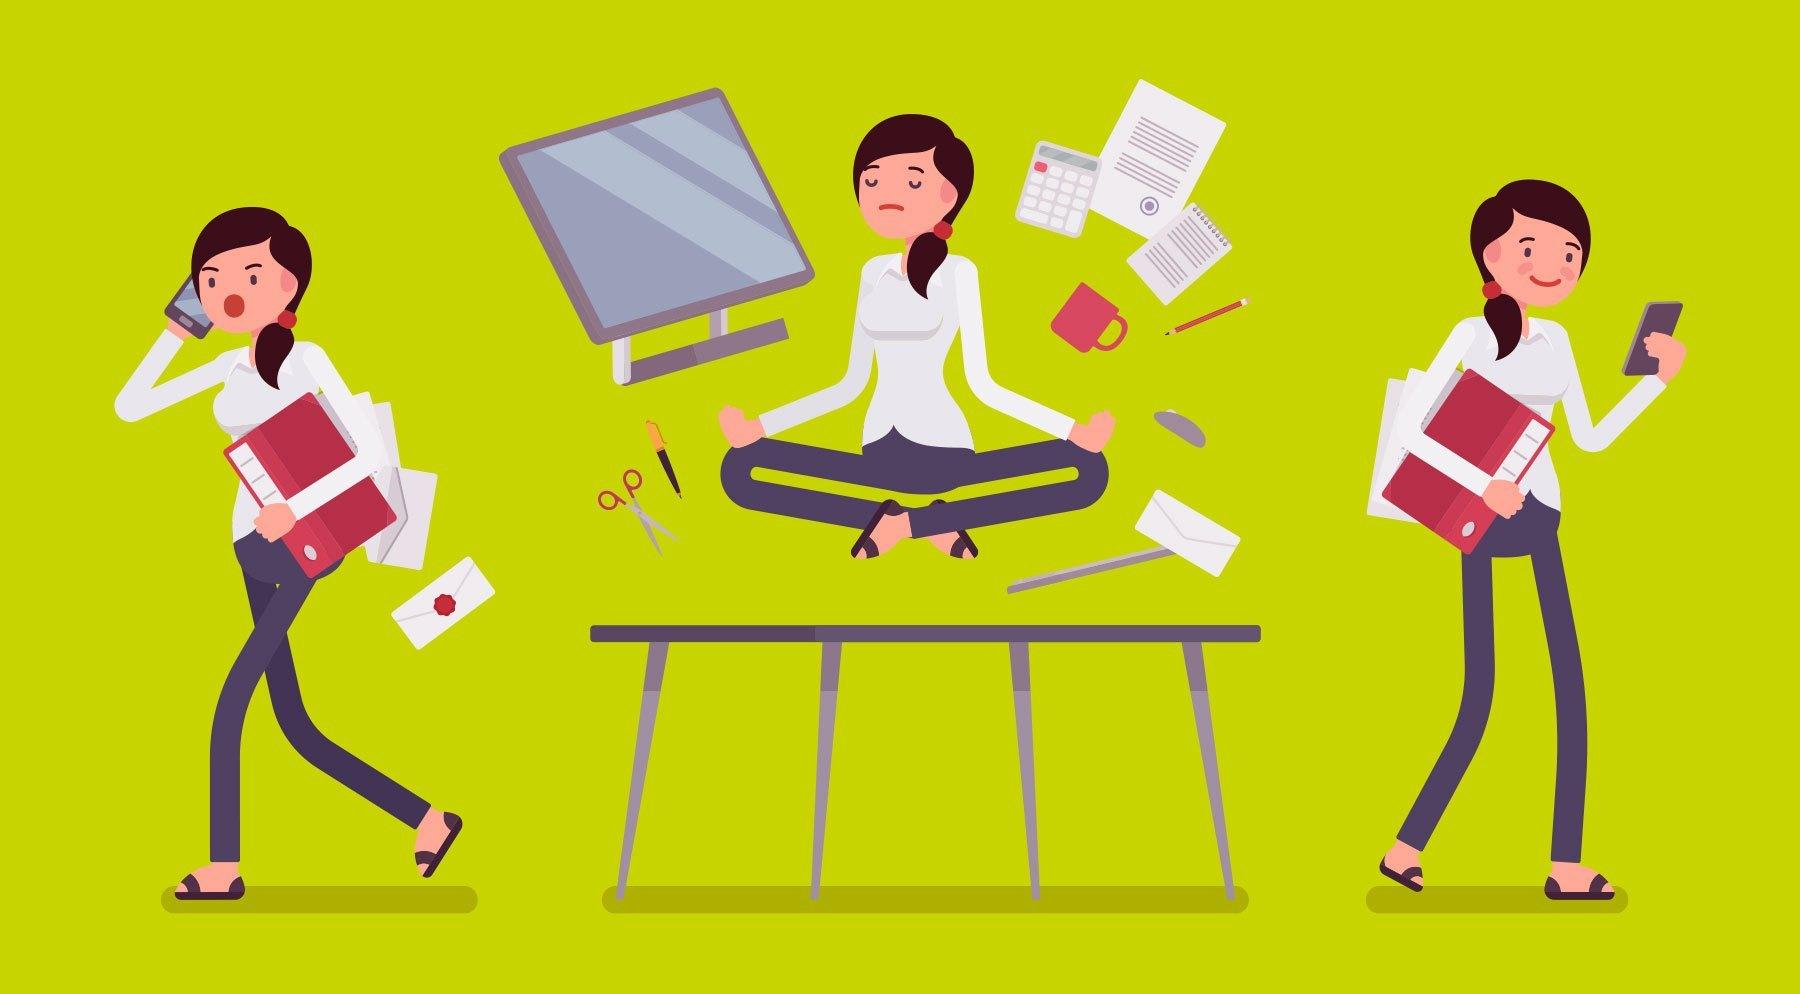 Stress clipart stress man. Management techniques around the